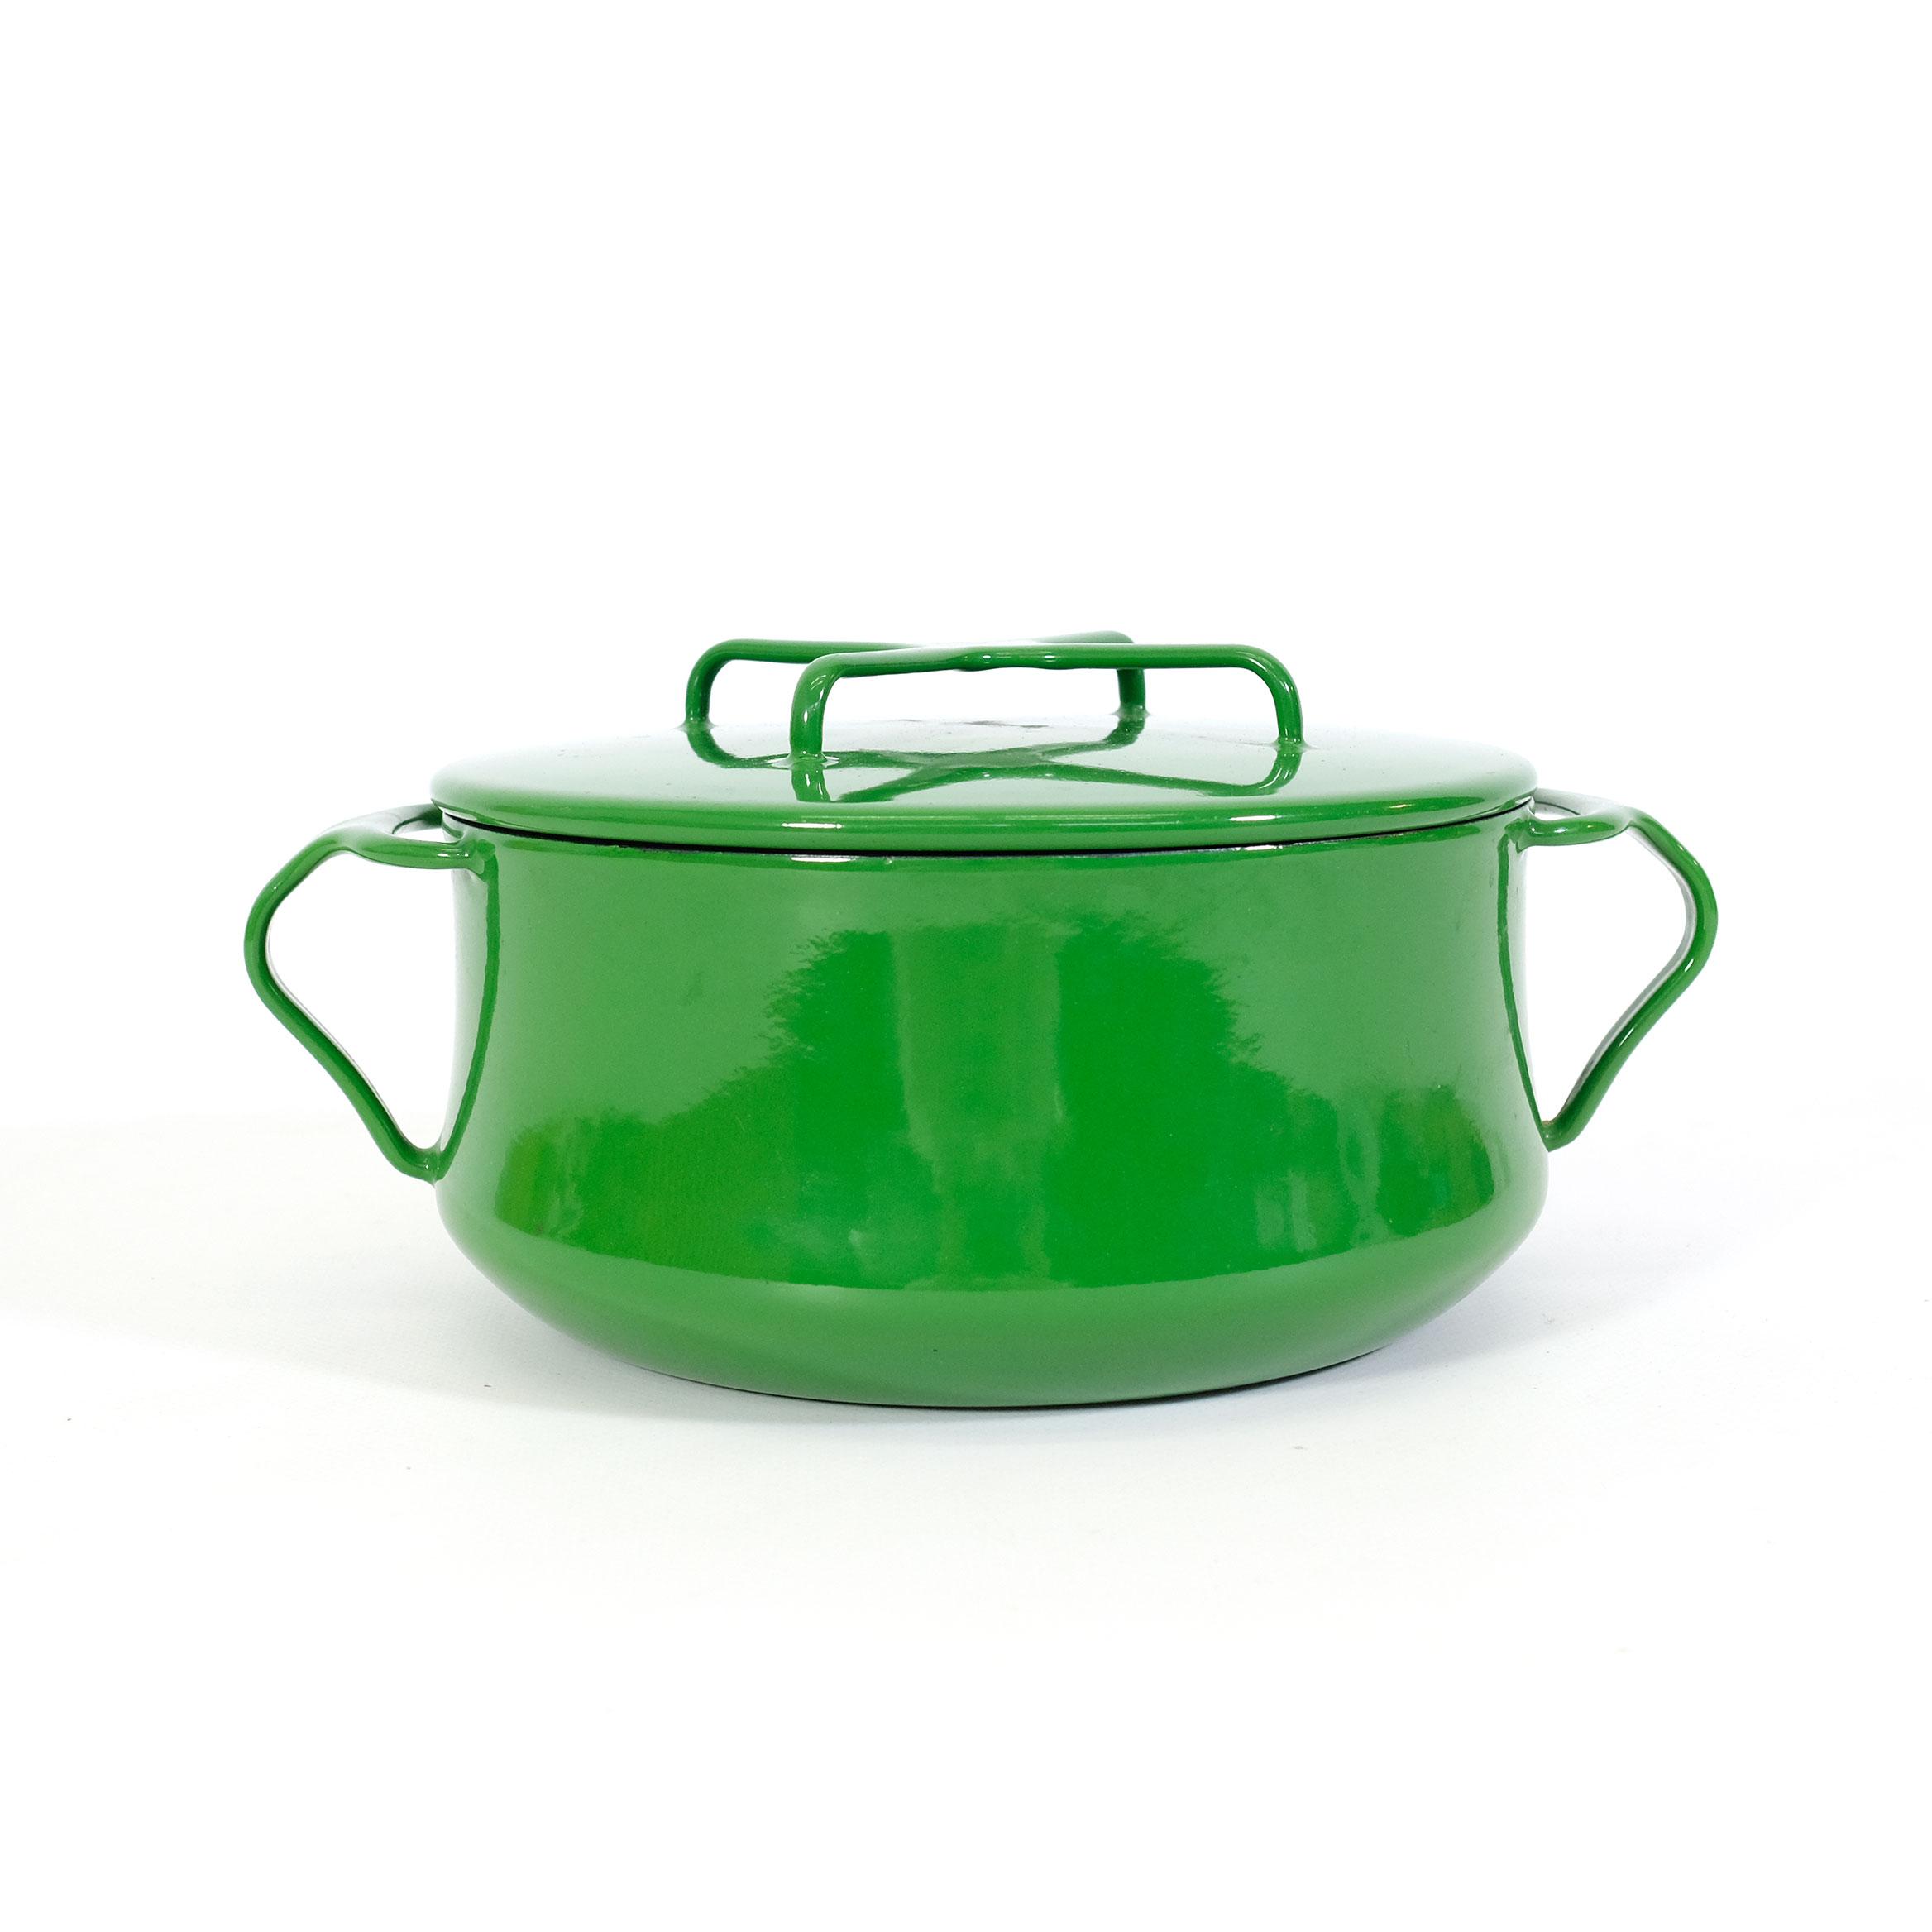 Kobenstyle green cooking pot by Dansk.